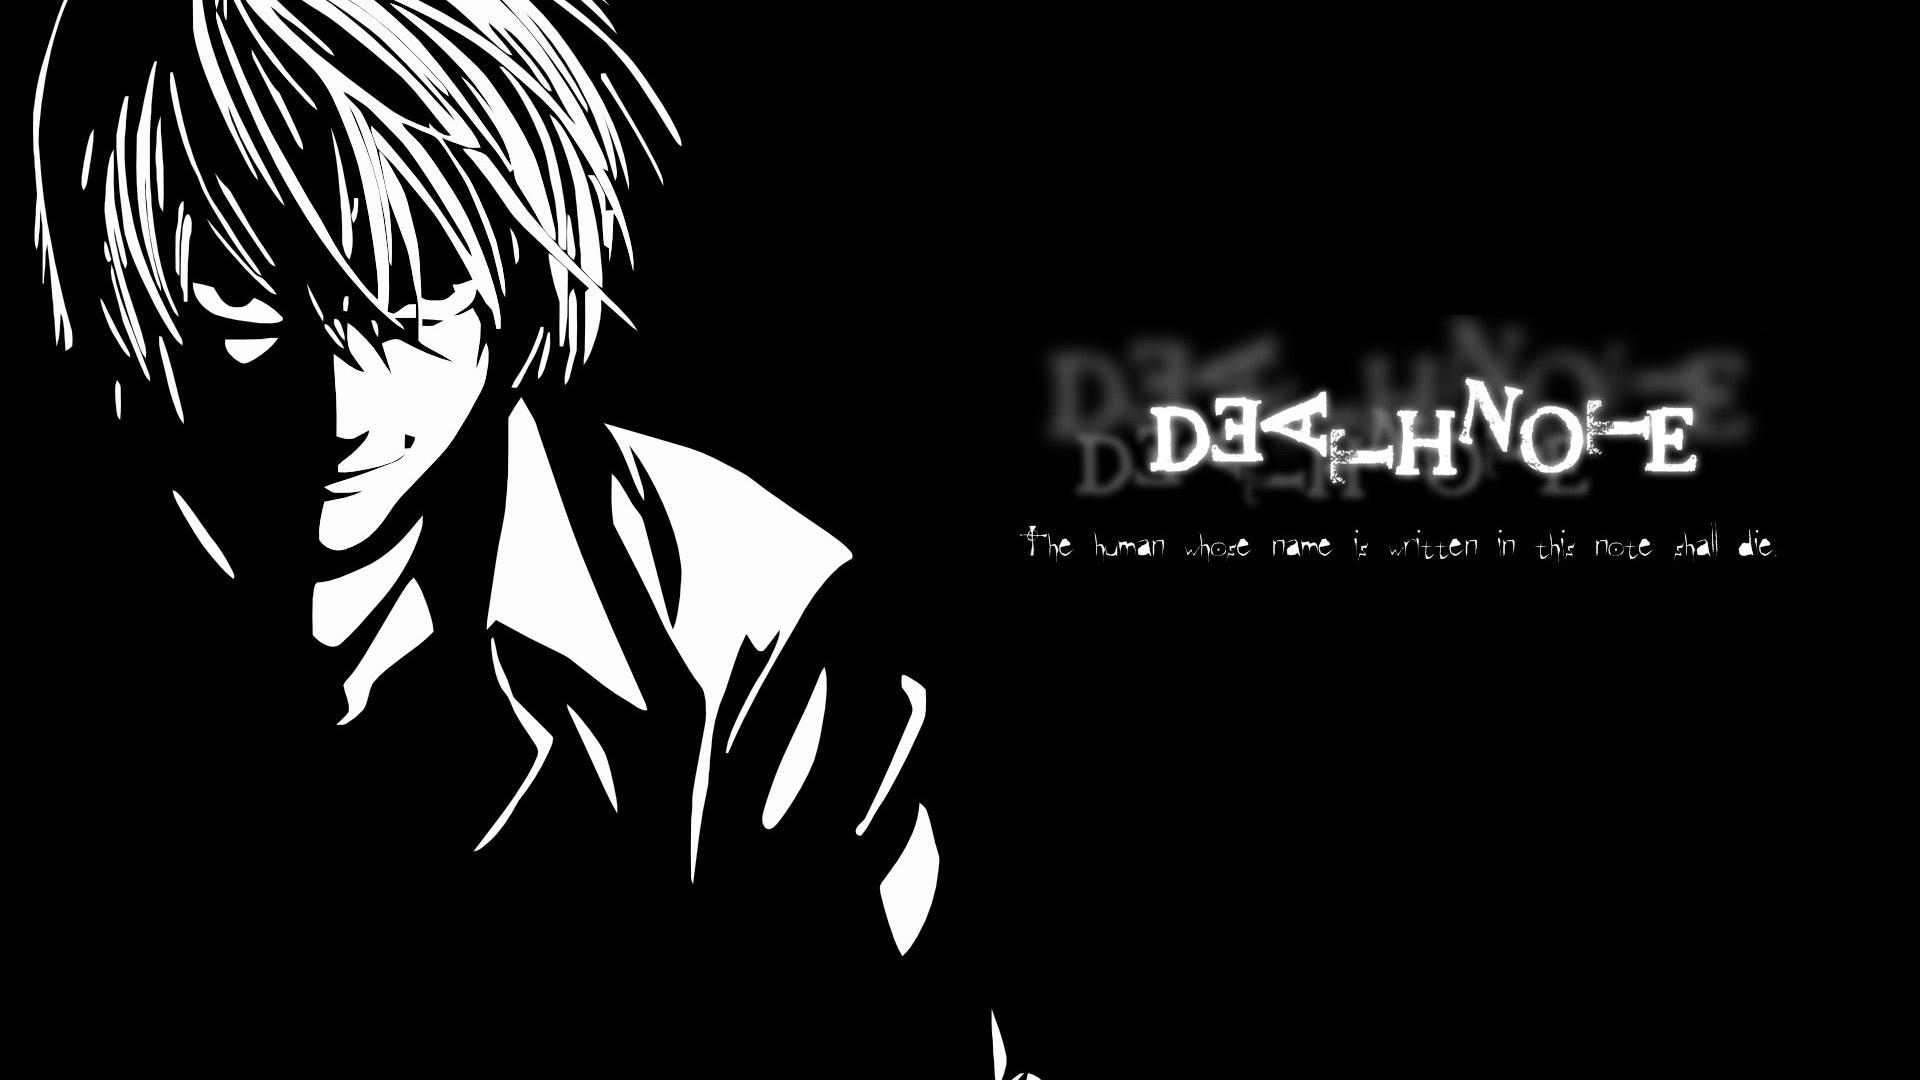 death note 1080p